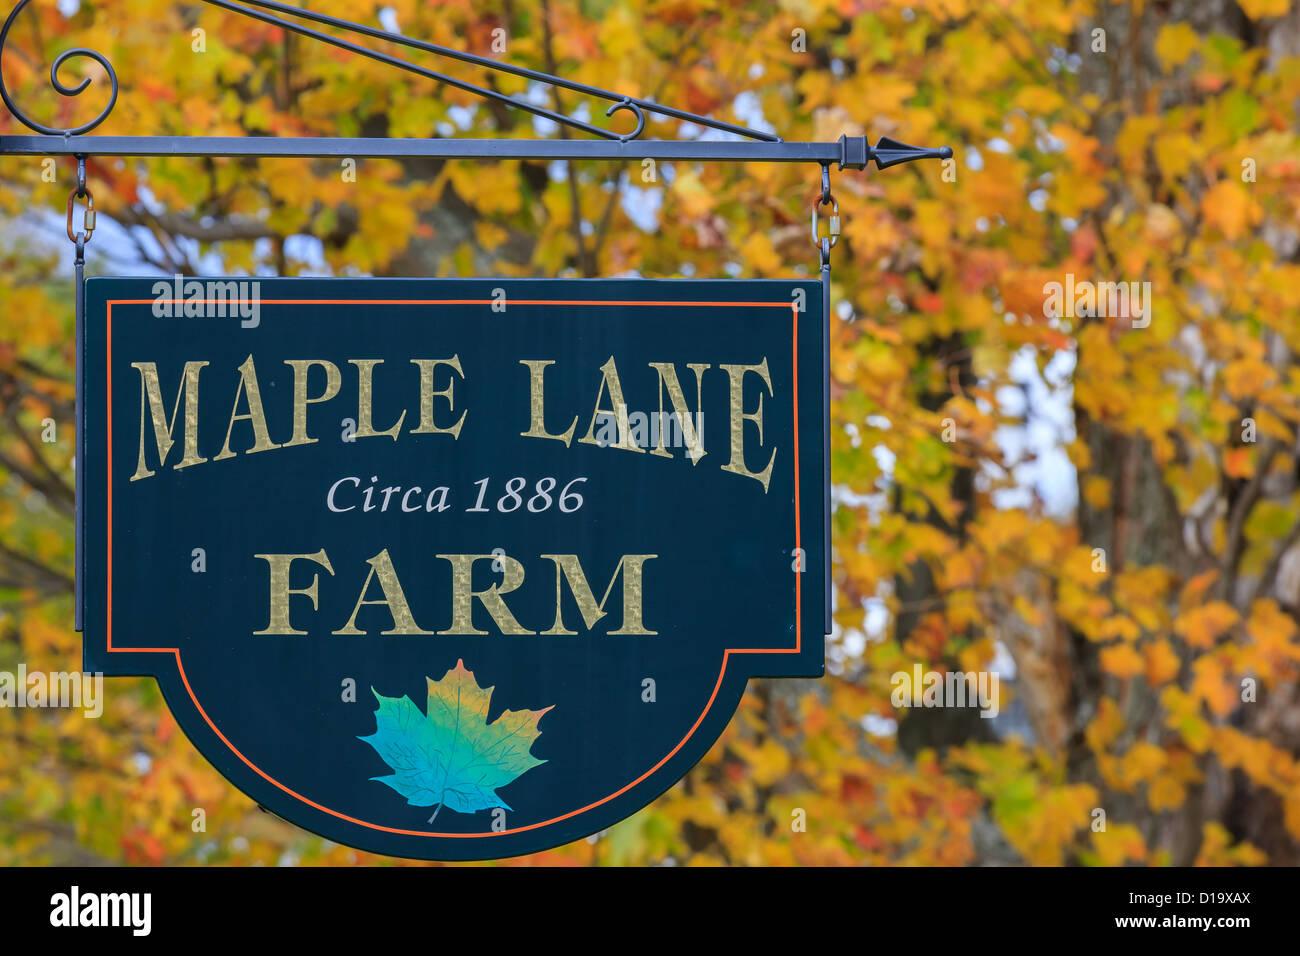 Maple Lane Farm, Vermont - Stock Image